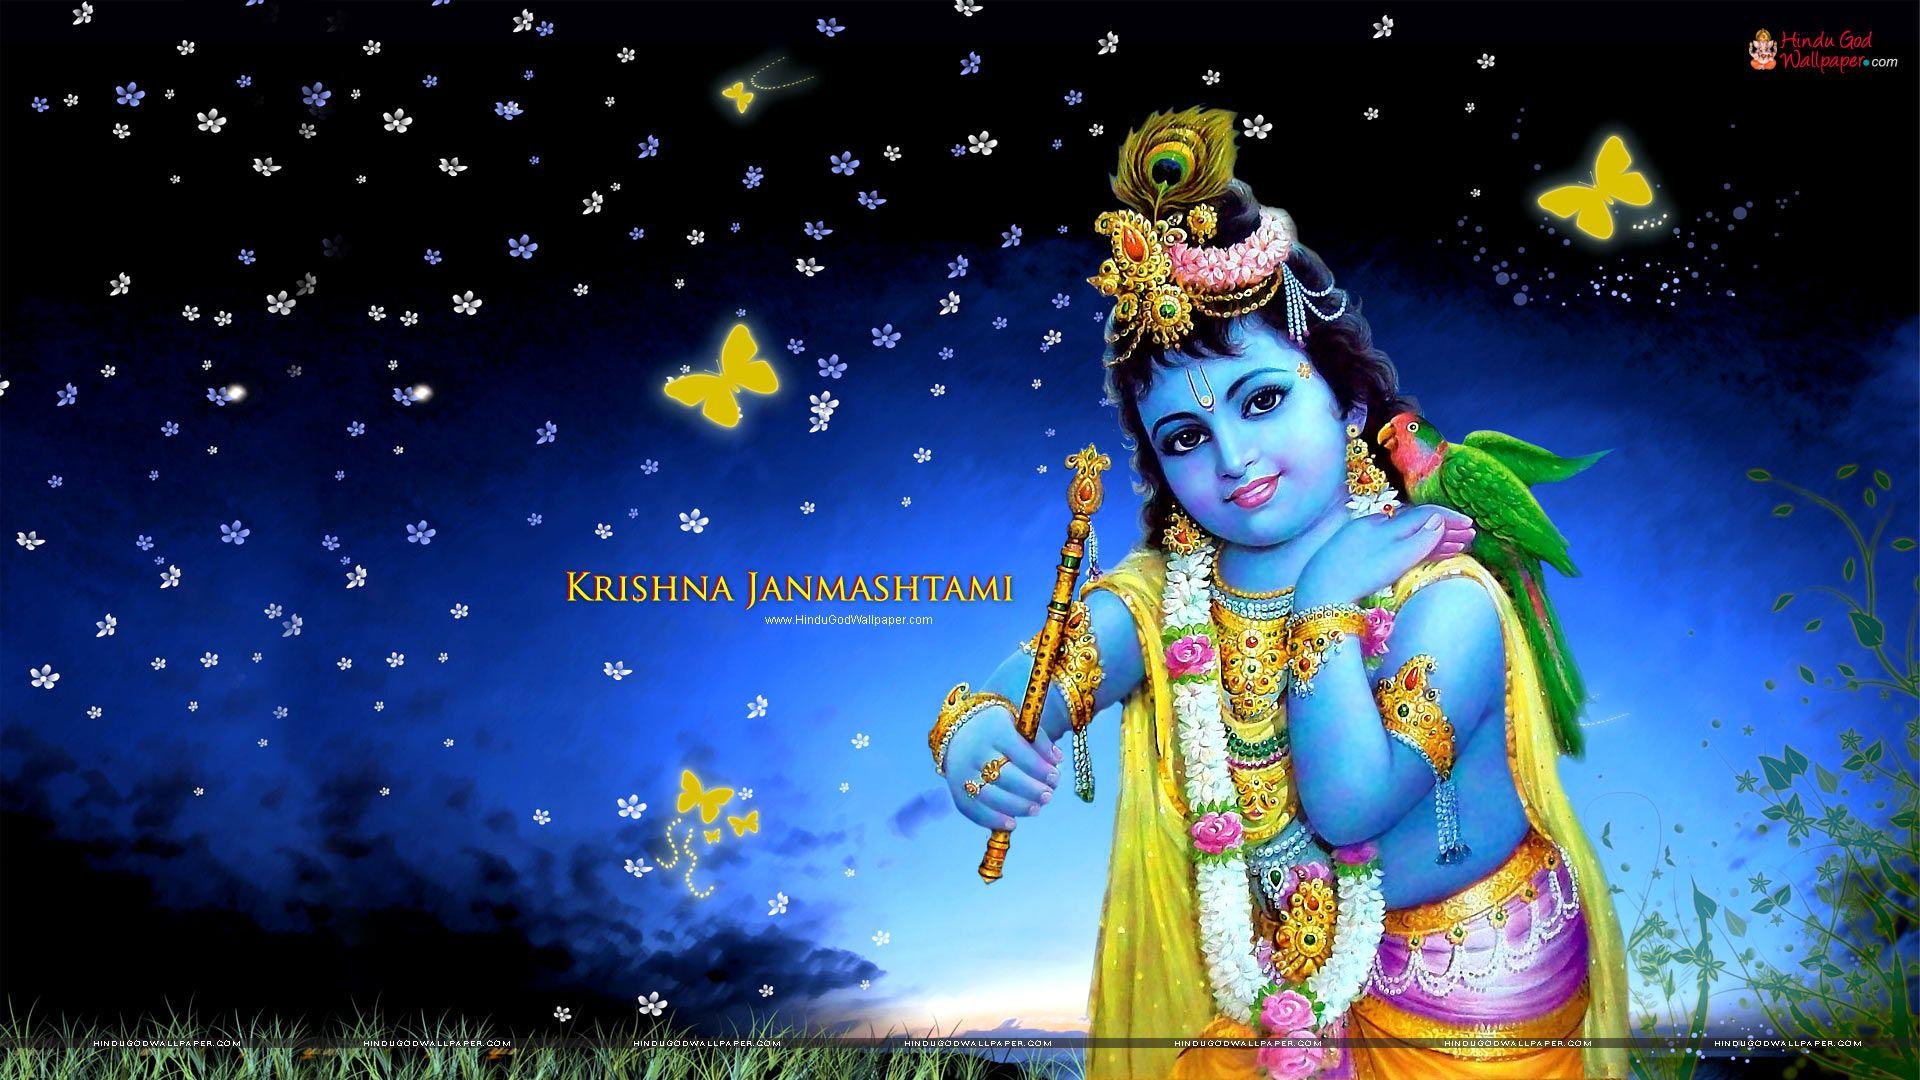 Wallpaper download janmashtami - Krishna Janmashtami Hd Wallpaper Download